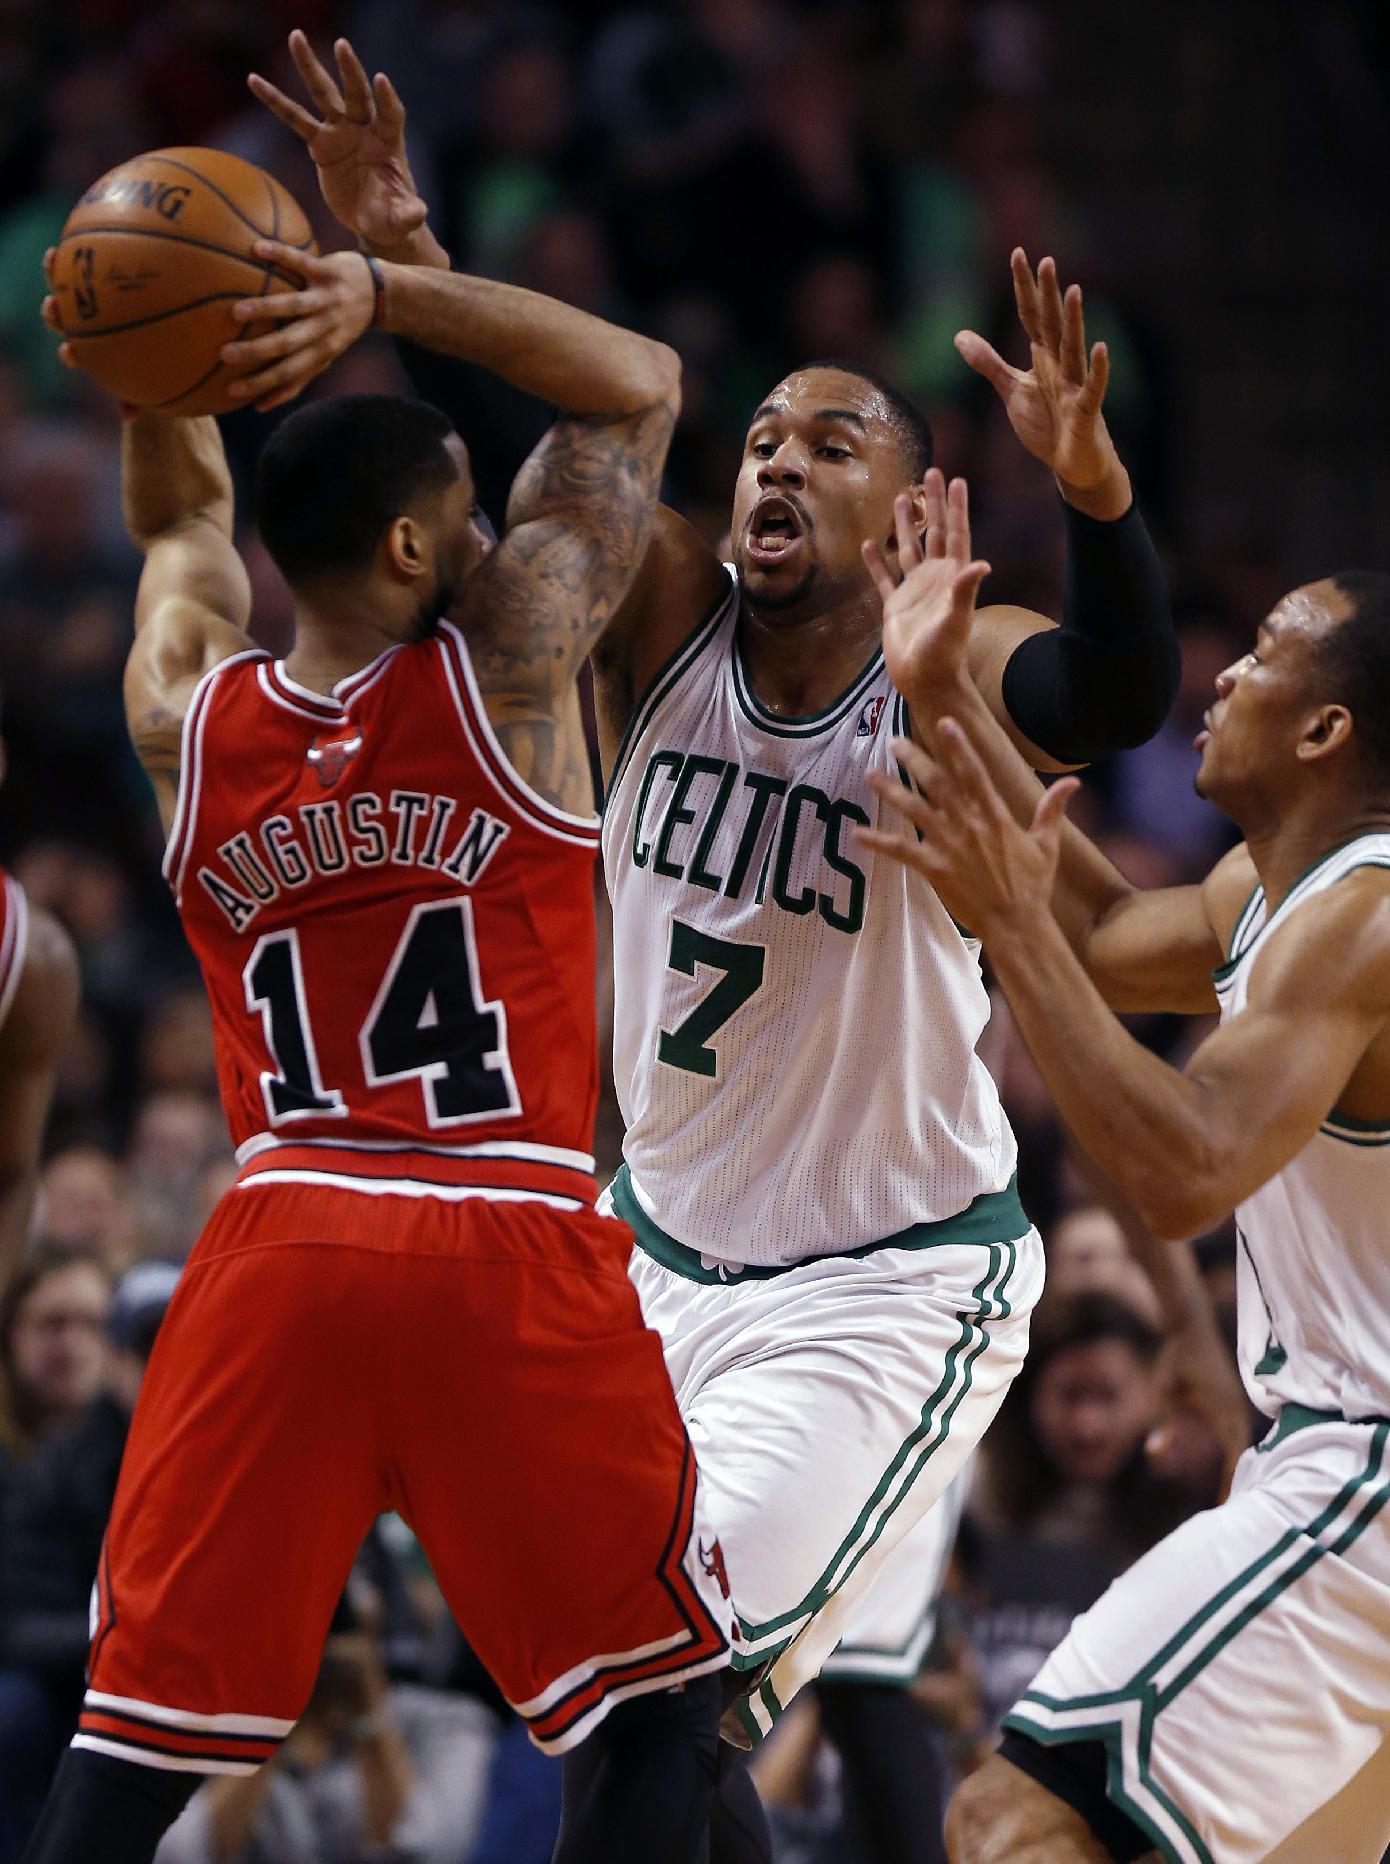 Boston Celtics' Jared Sullinger (7) defends against Chicago Bulls' D.J. Augustin (14) in the fourth quarter of an NBA basketball game in Boston, Sunday, March 30, 2014. The Bulls won 107-102